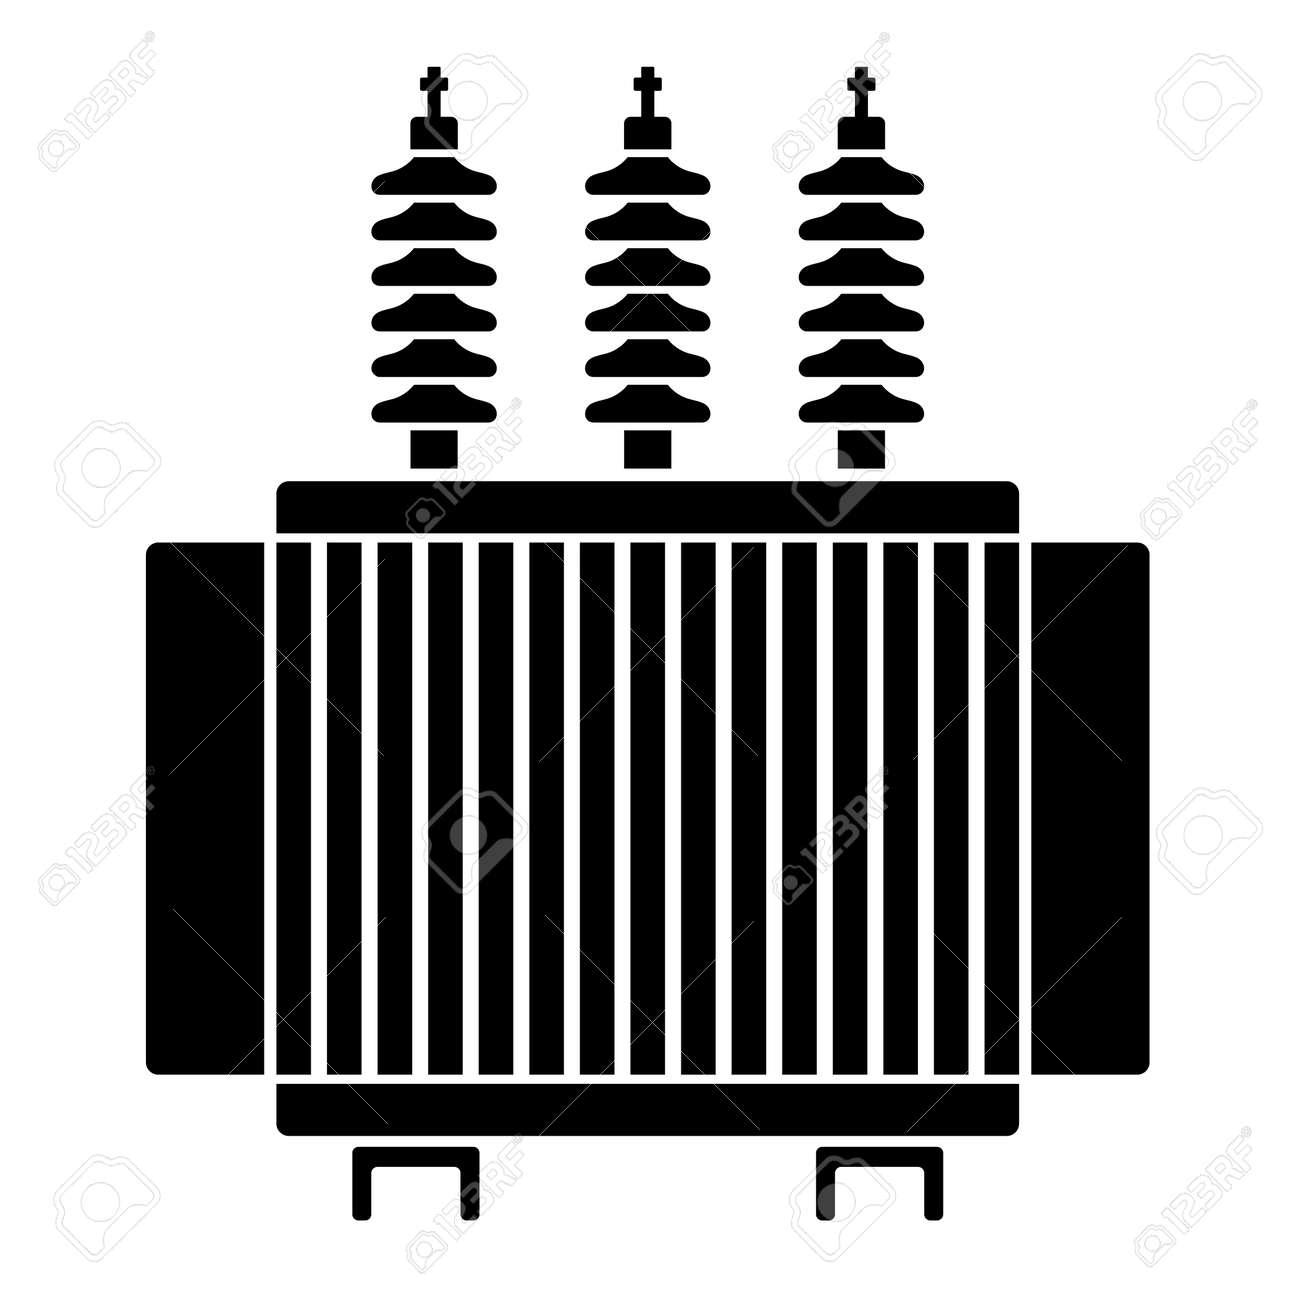 High Voltage Electrical Transformer Black Symbol Royalty Free ...